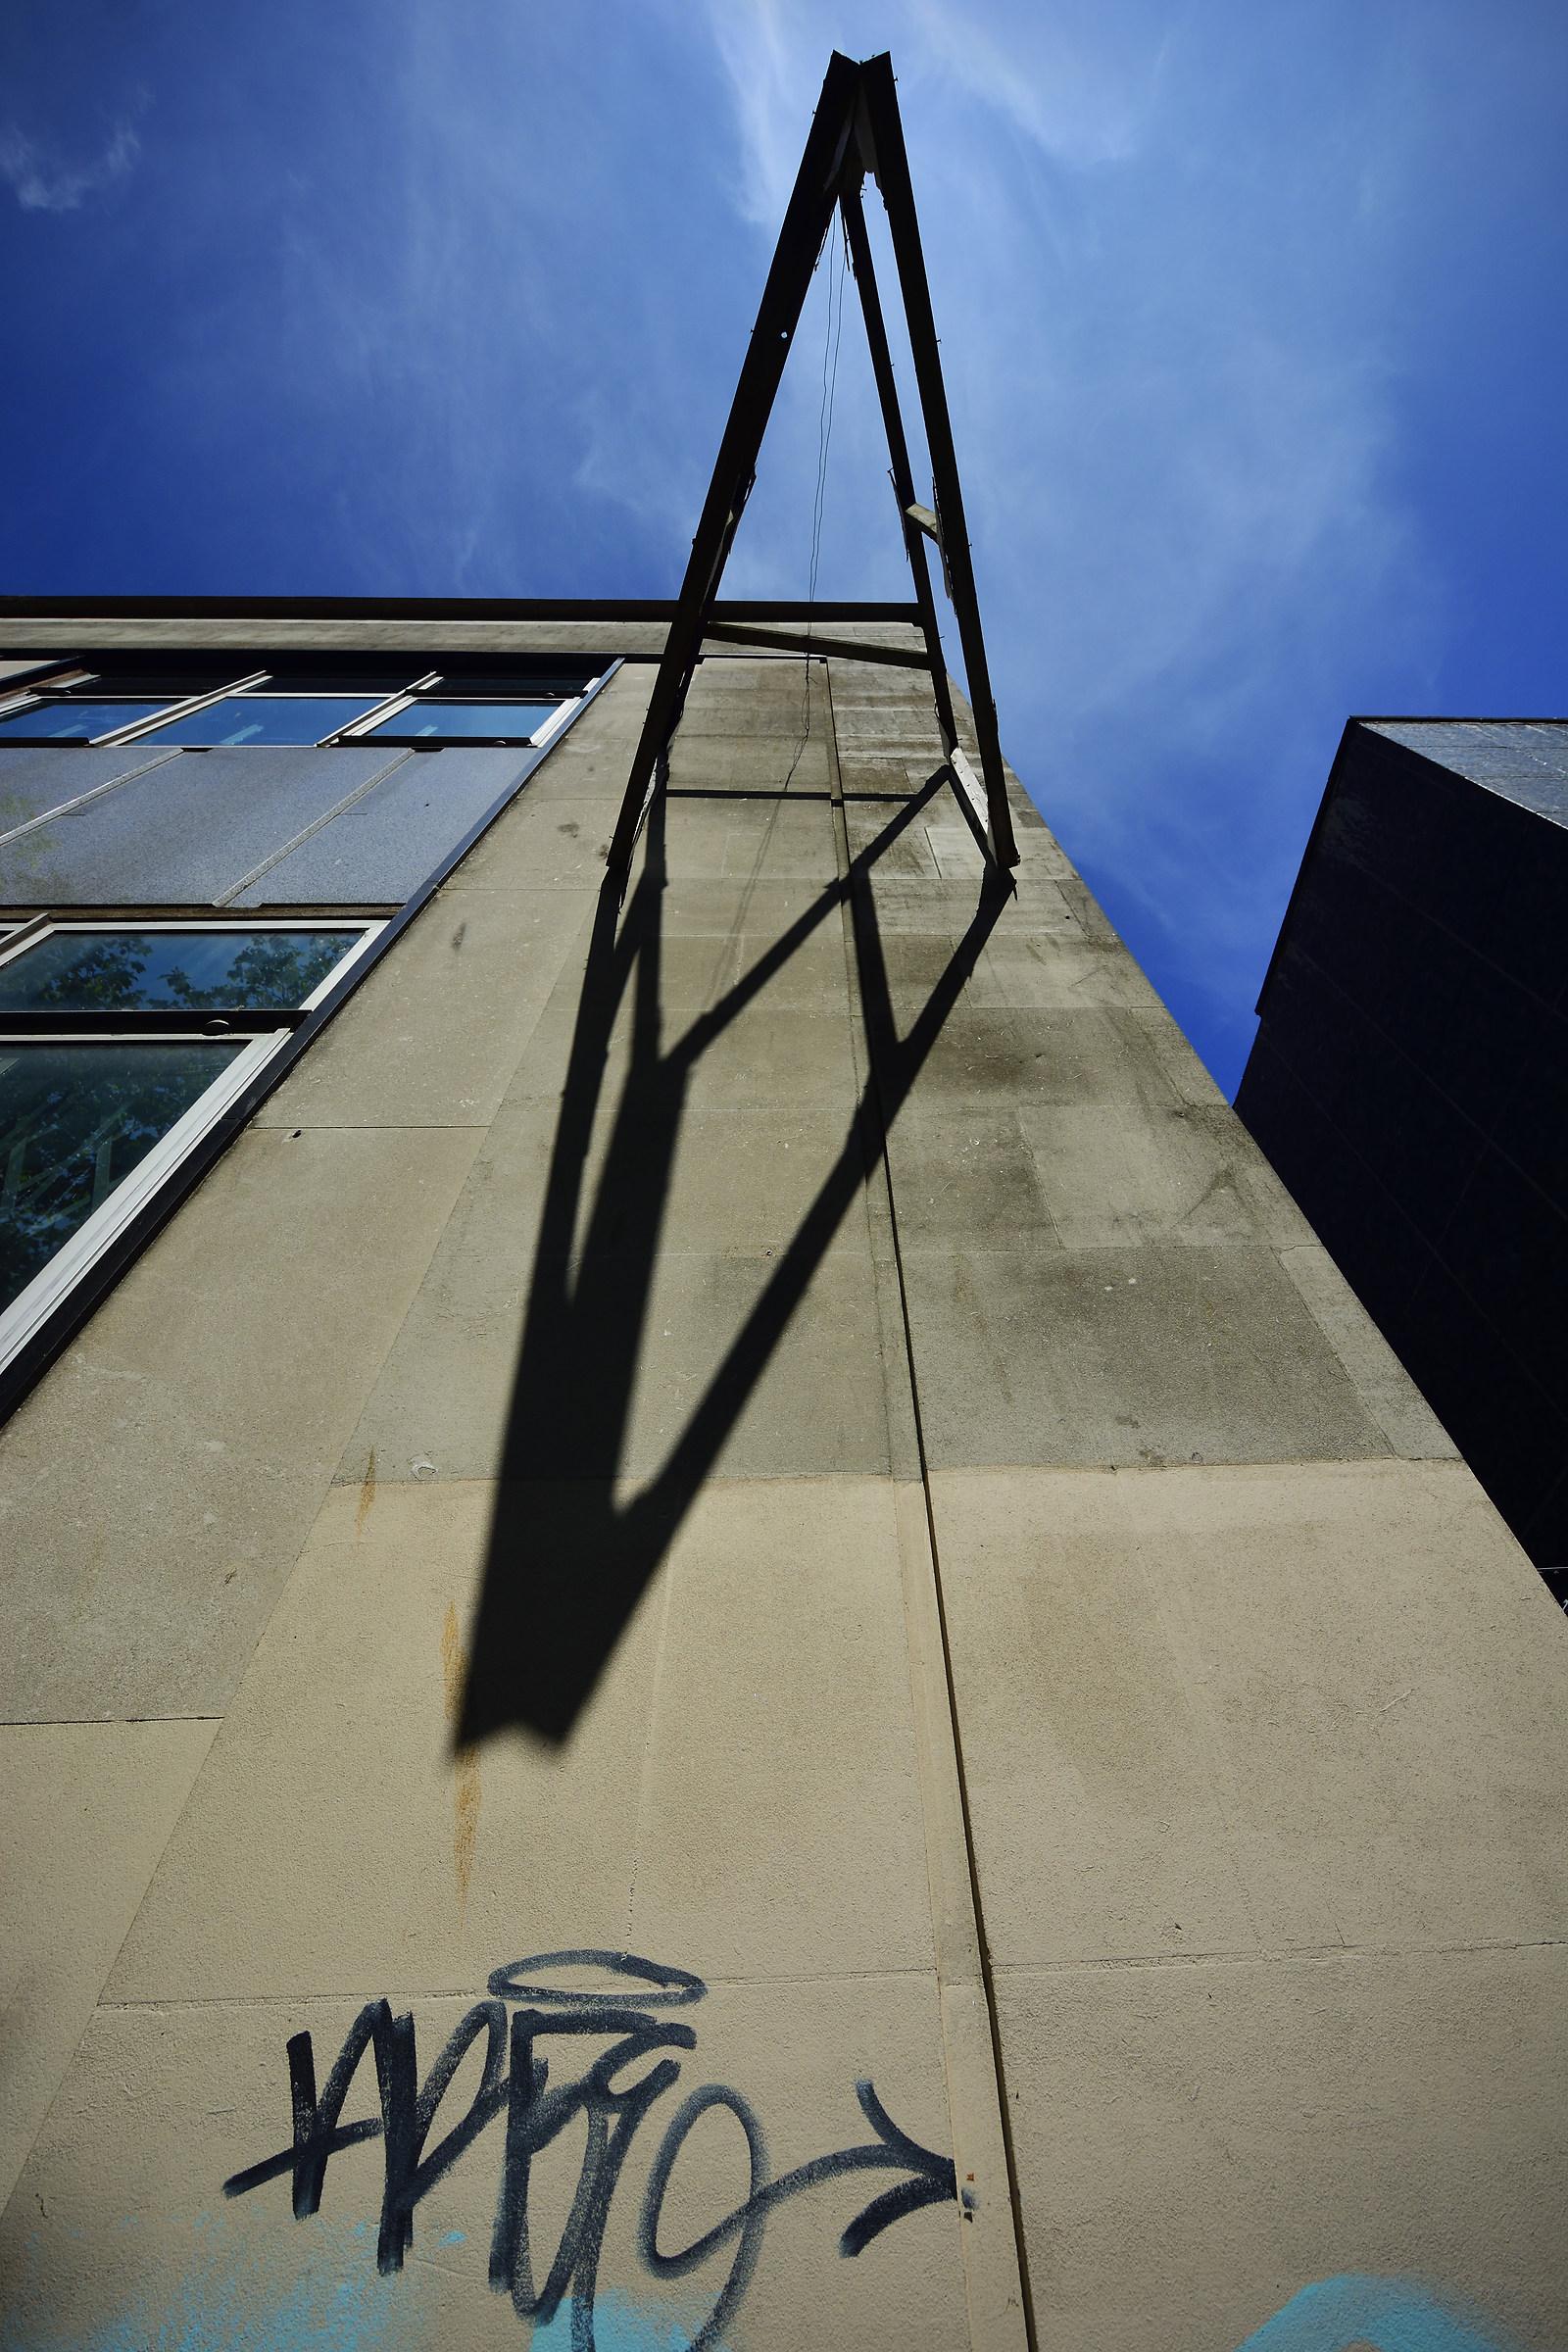 Wonderful Bristol Dereliction: Why Shadows Can Be Vital...